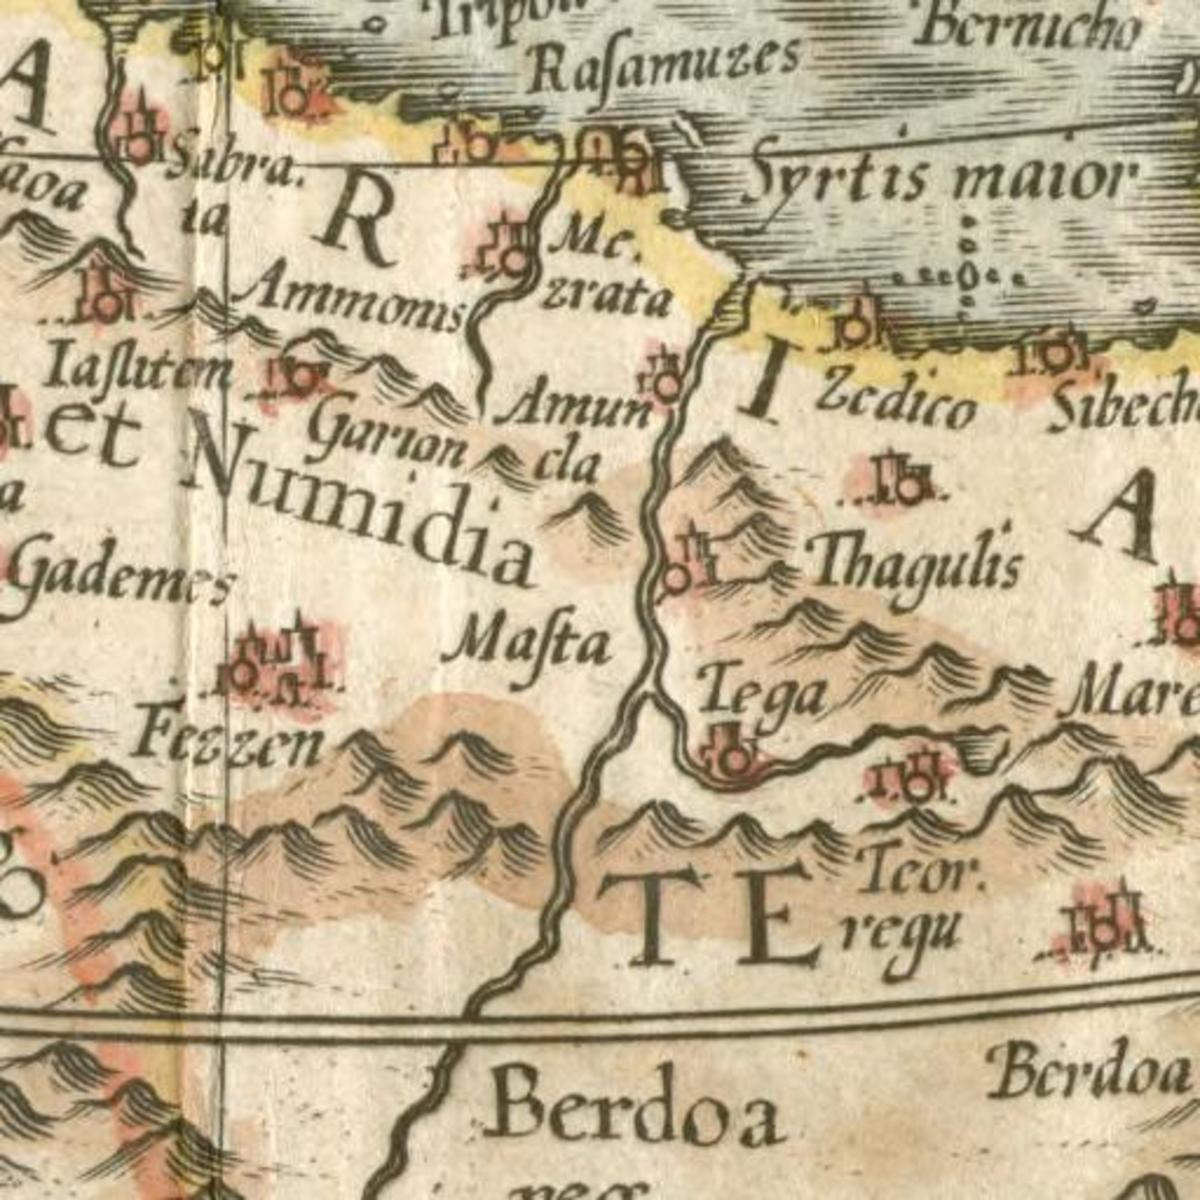 Ammon North Africa 1727